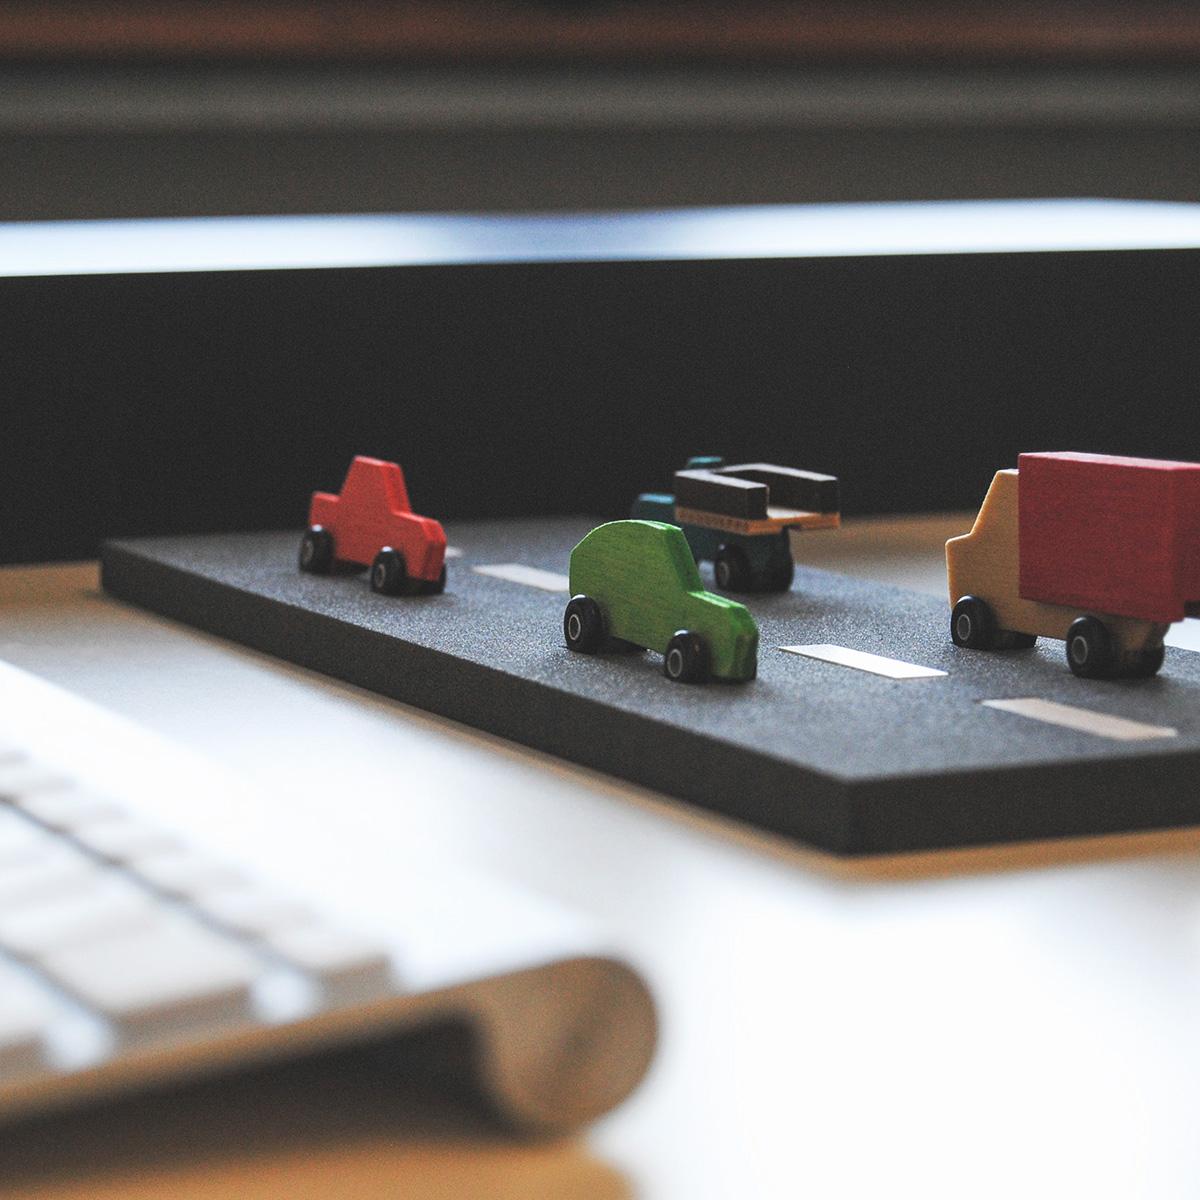 macchinina-legno-toy-wood-design-desk